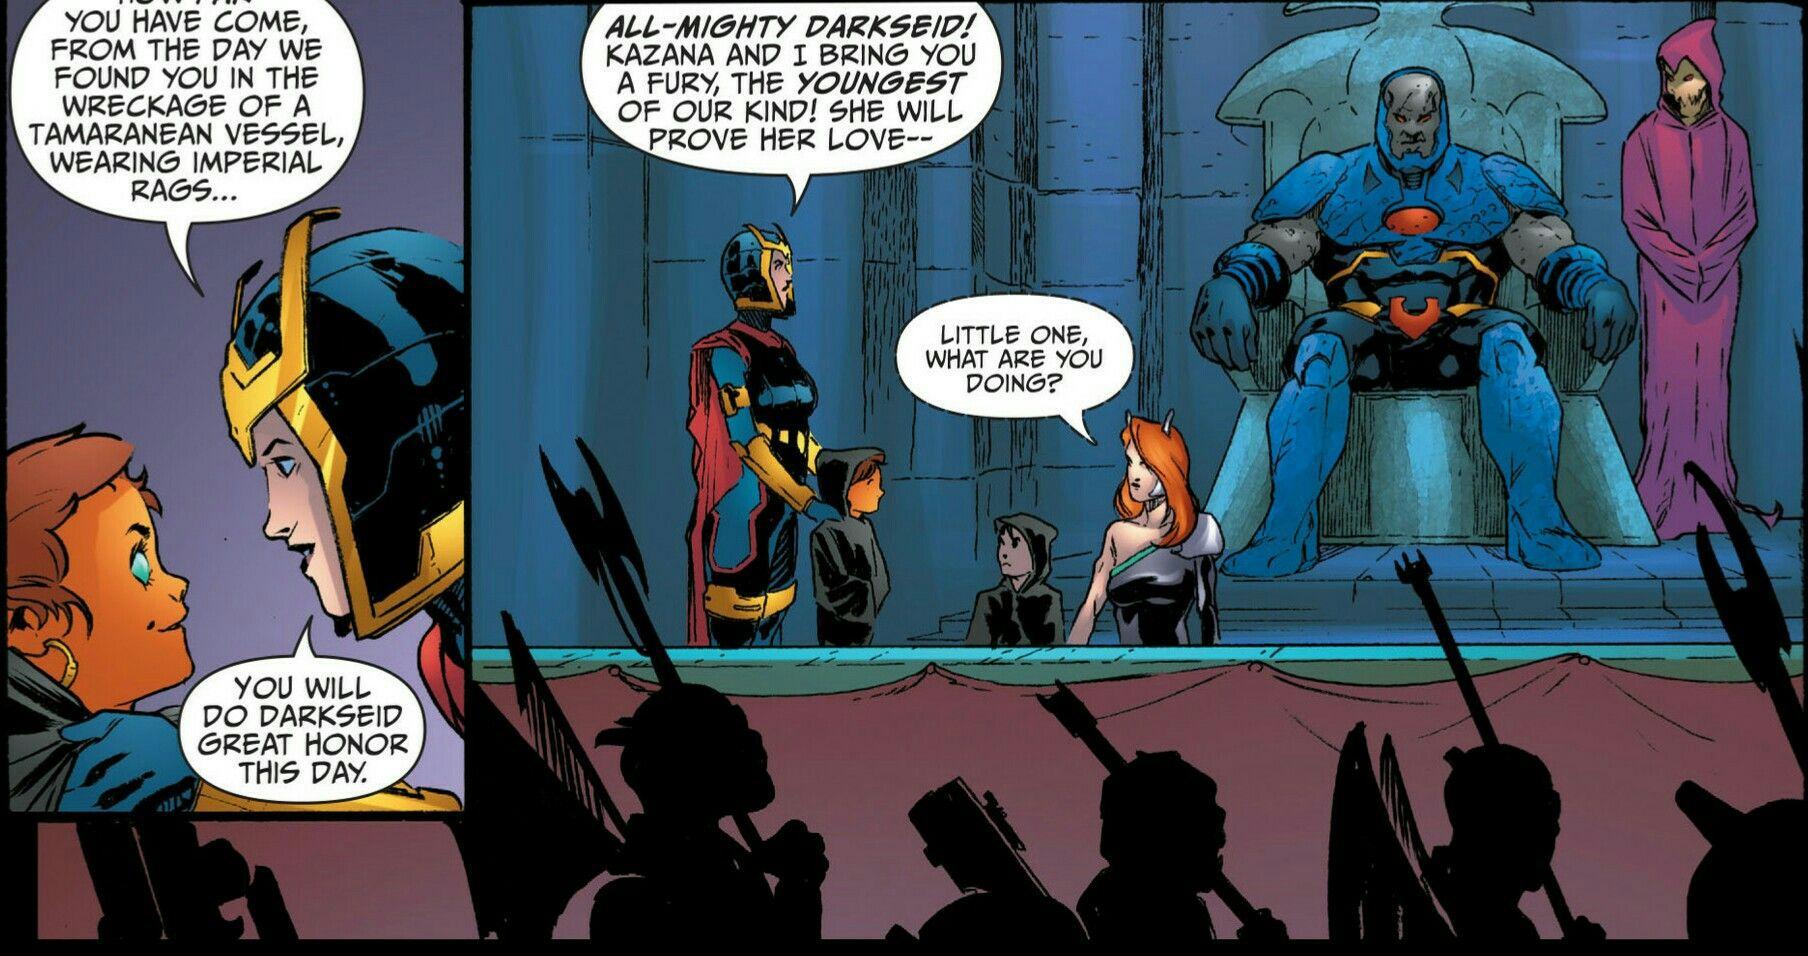 Darkseid, Desaad, and Big Barda with future Four Furies of Apokolips War